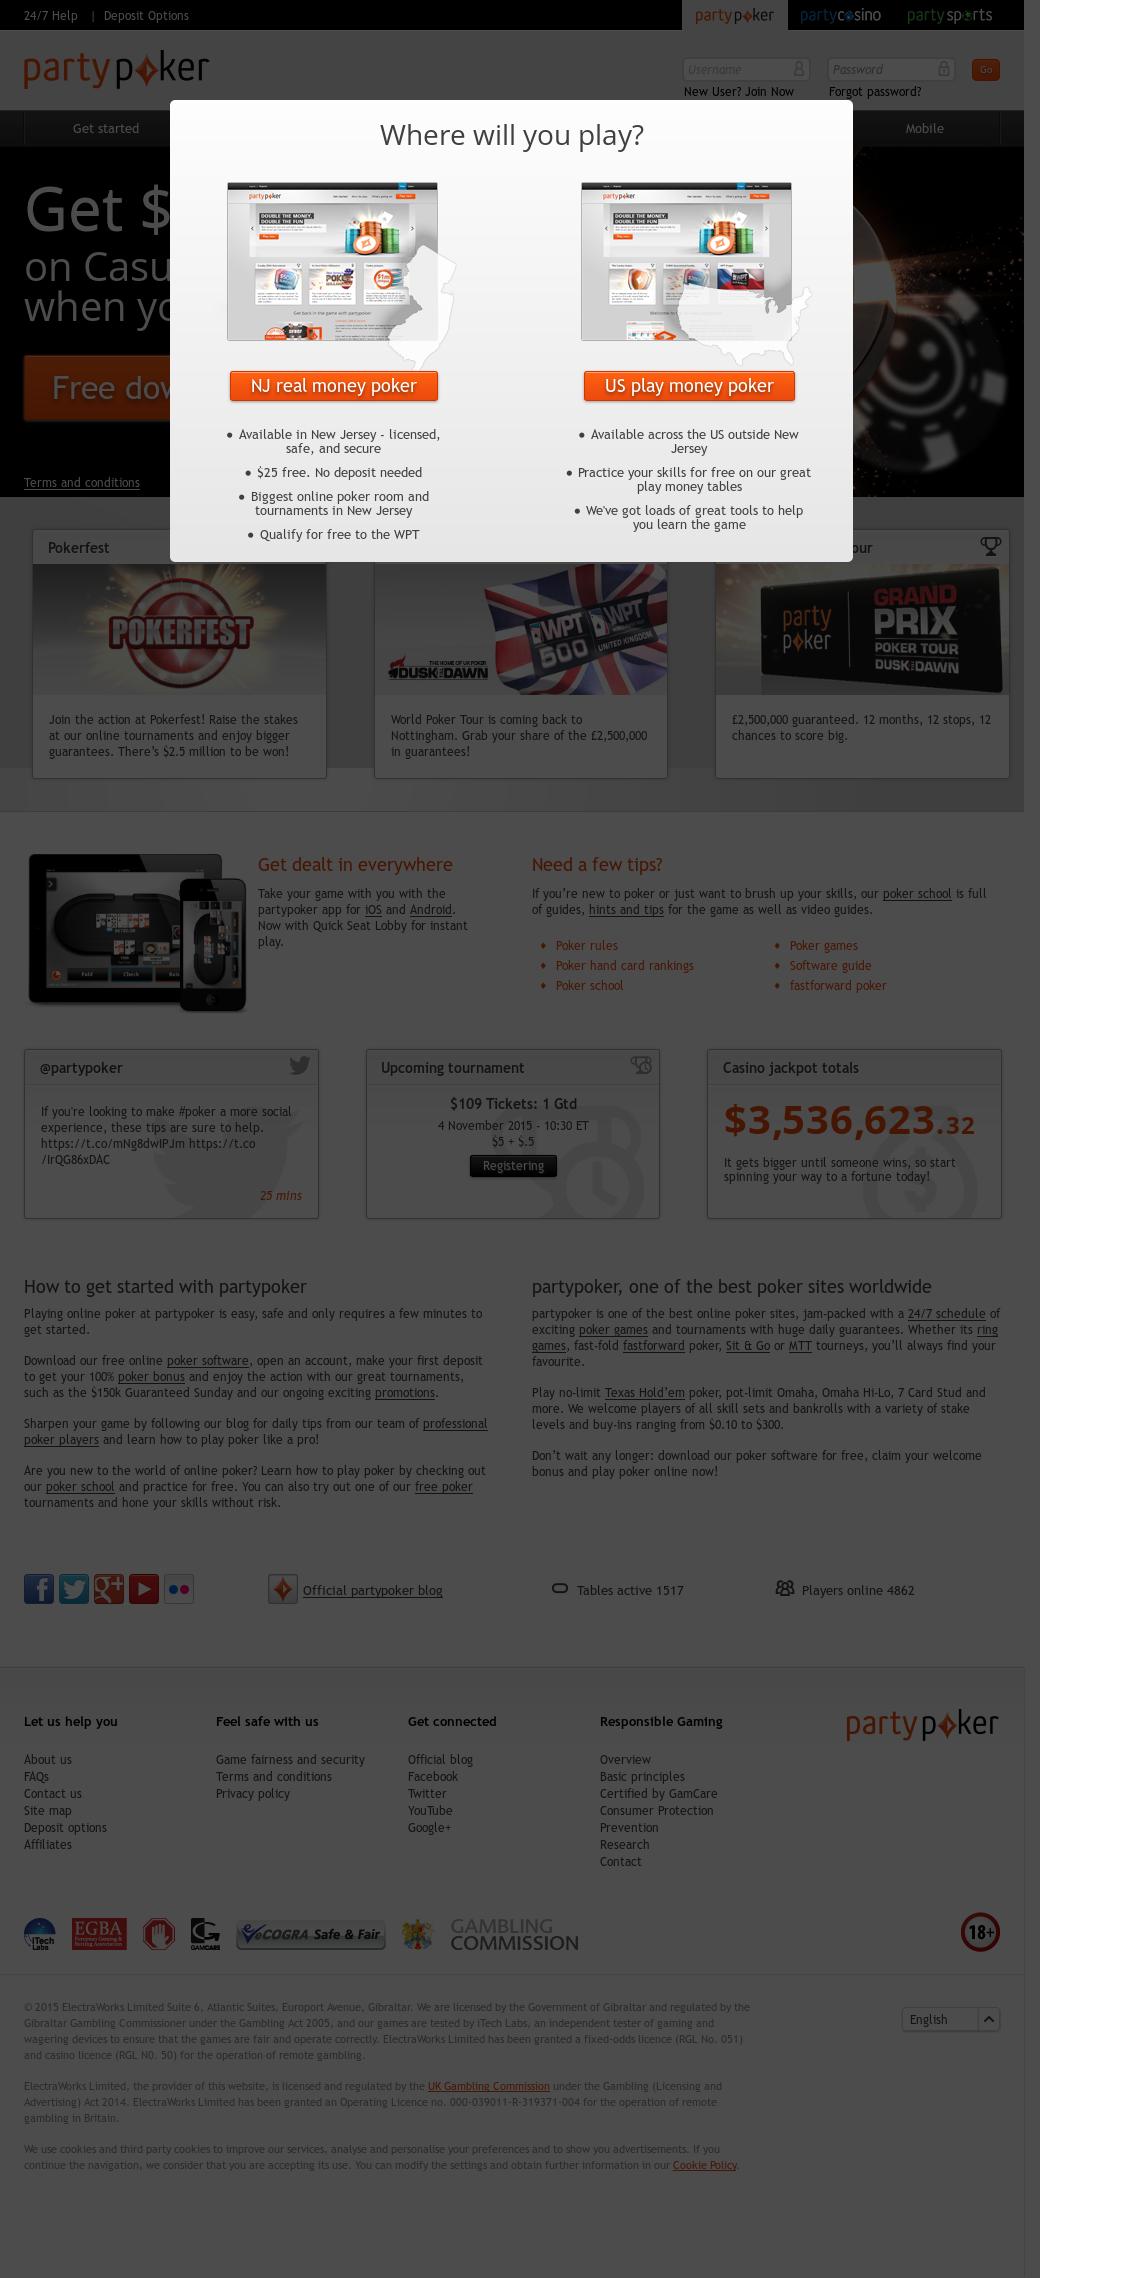 888 poker download vista